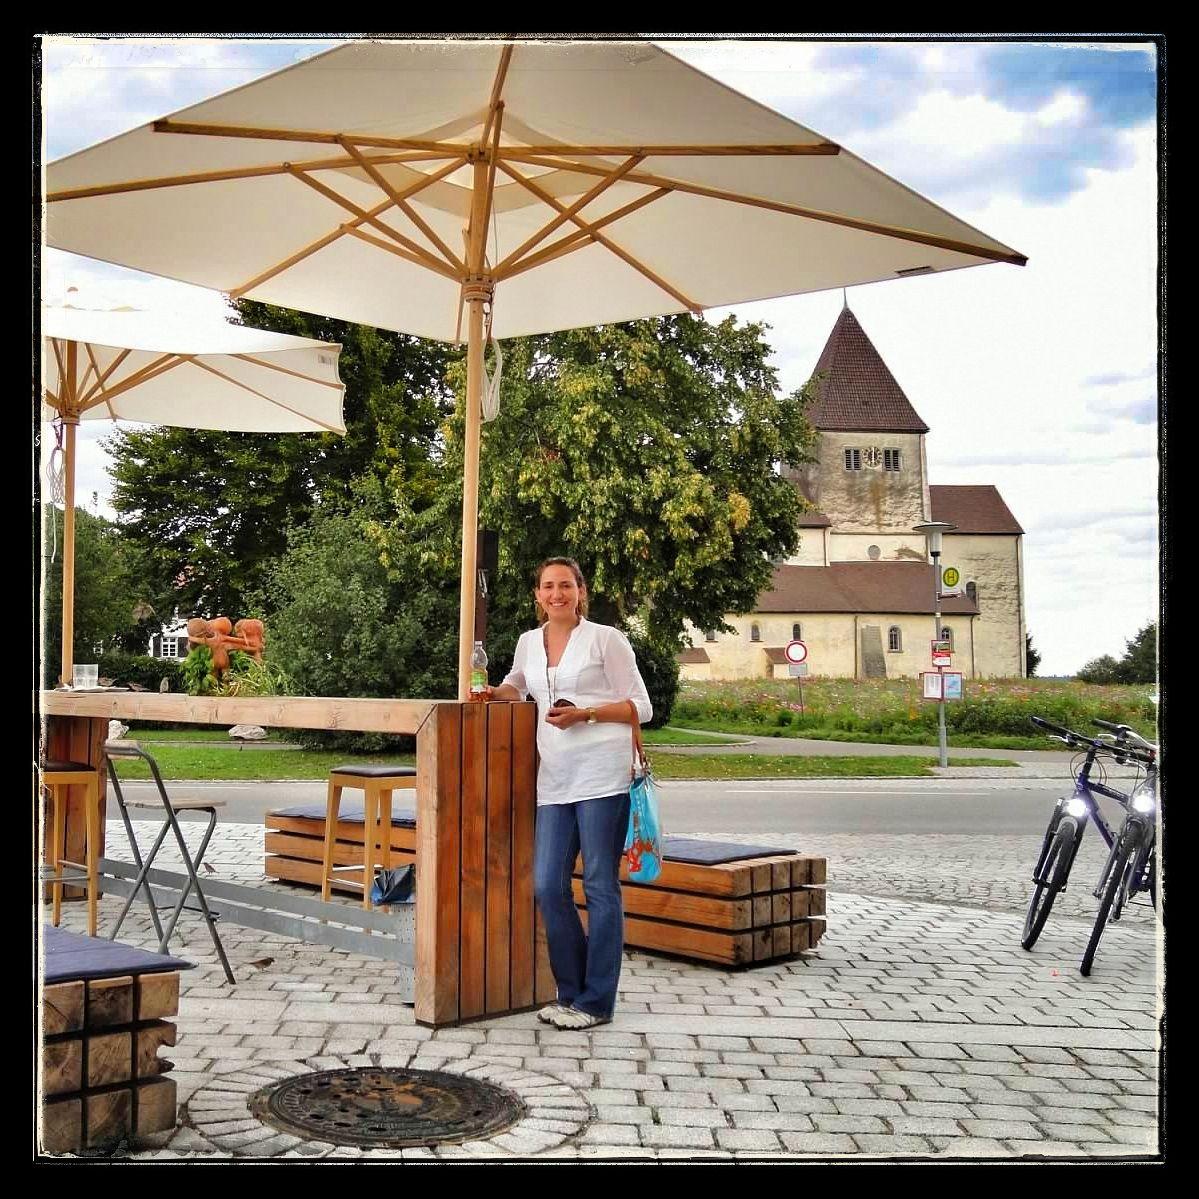 Insel Reichenau 2011 Beautiful place!